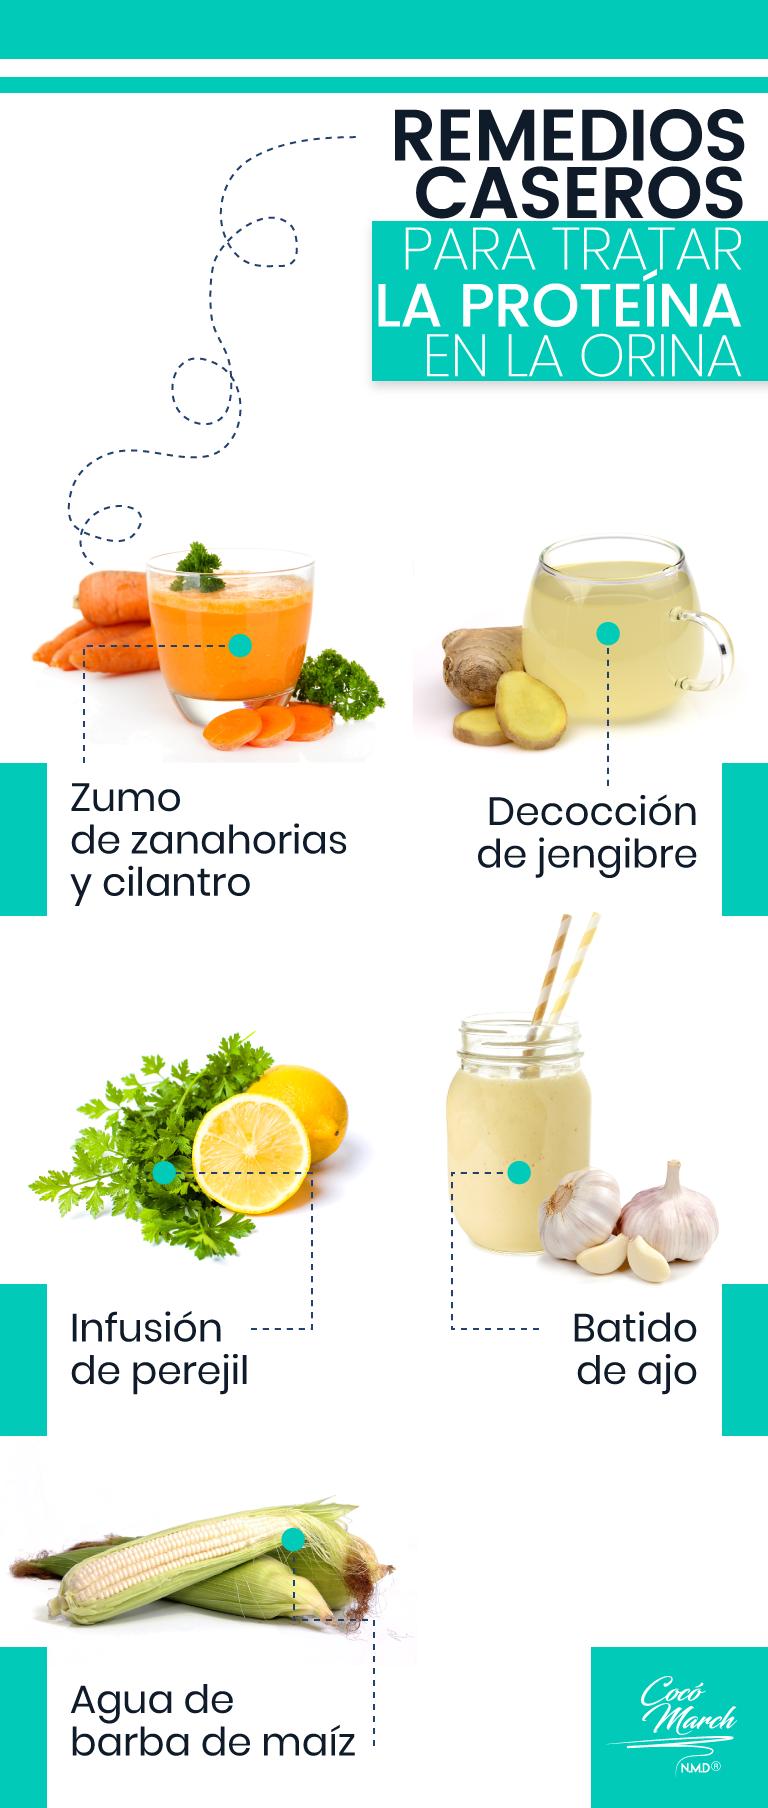 proteina durante la dieta detox